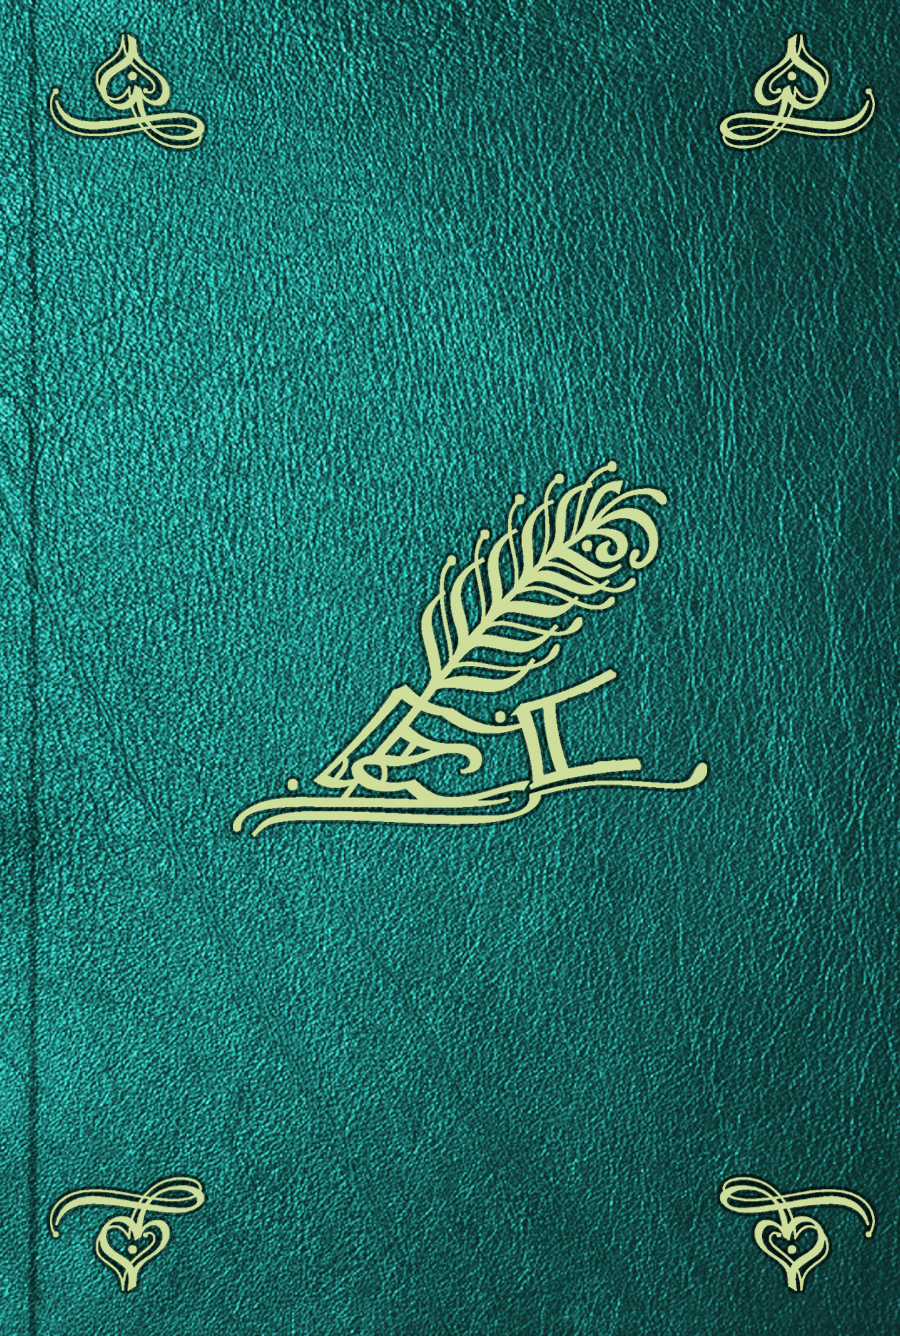 Pierre Loius Ginguené Storia della letteratura italiana. T. 6 pierre loius ginguené histoire littéraire d italie t 2